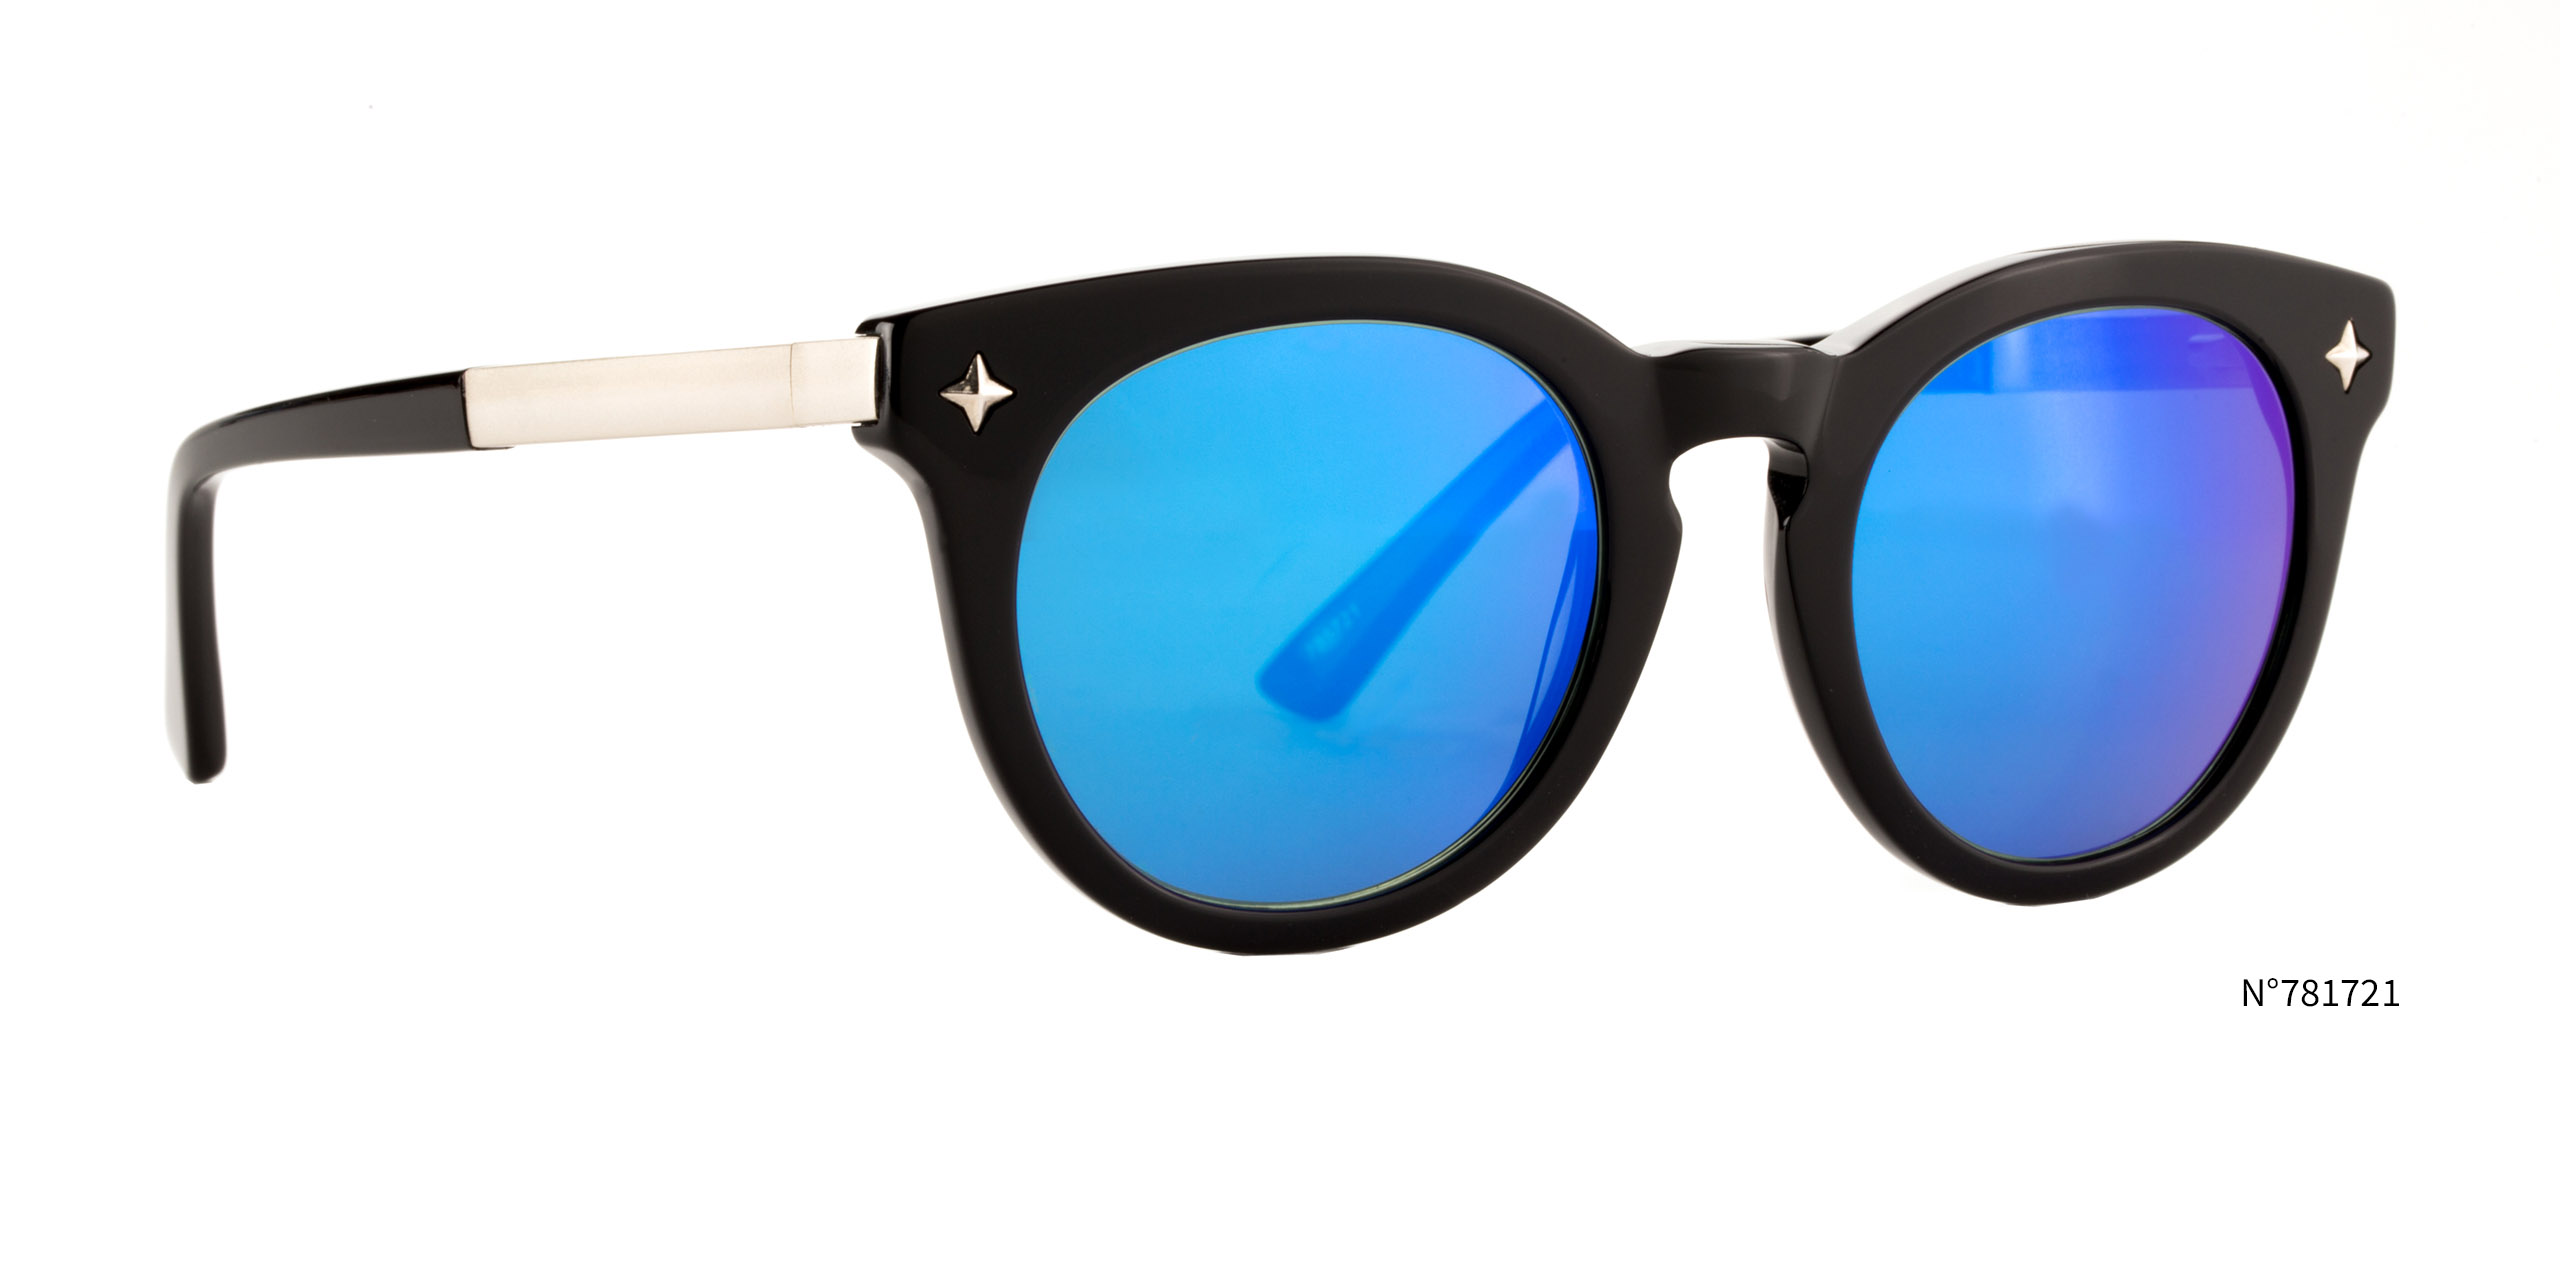 green-blue-mirrored-round-sunglasses-781721